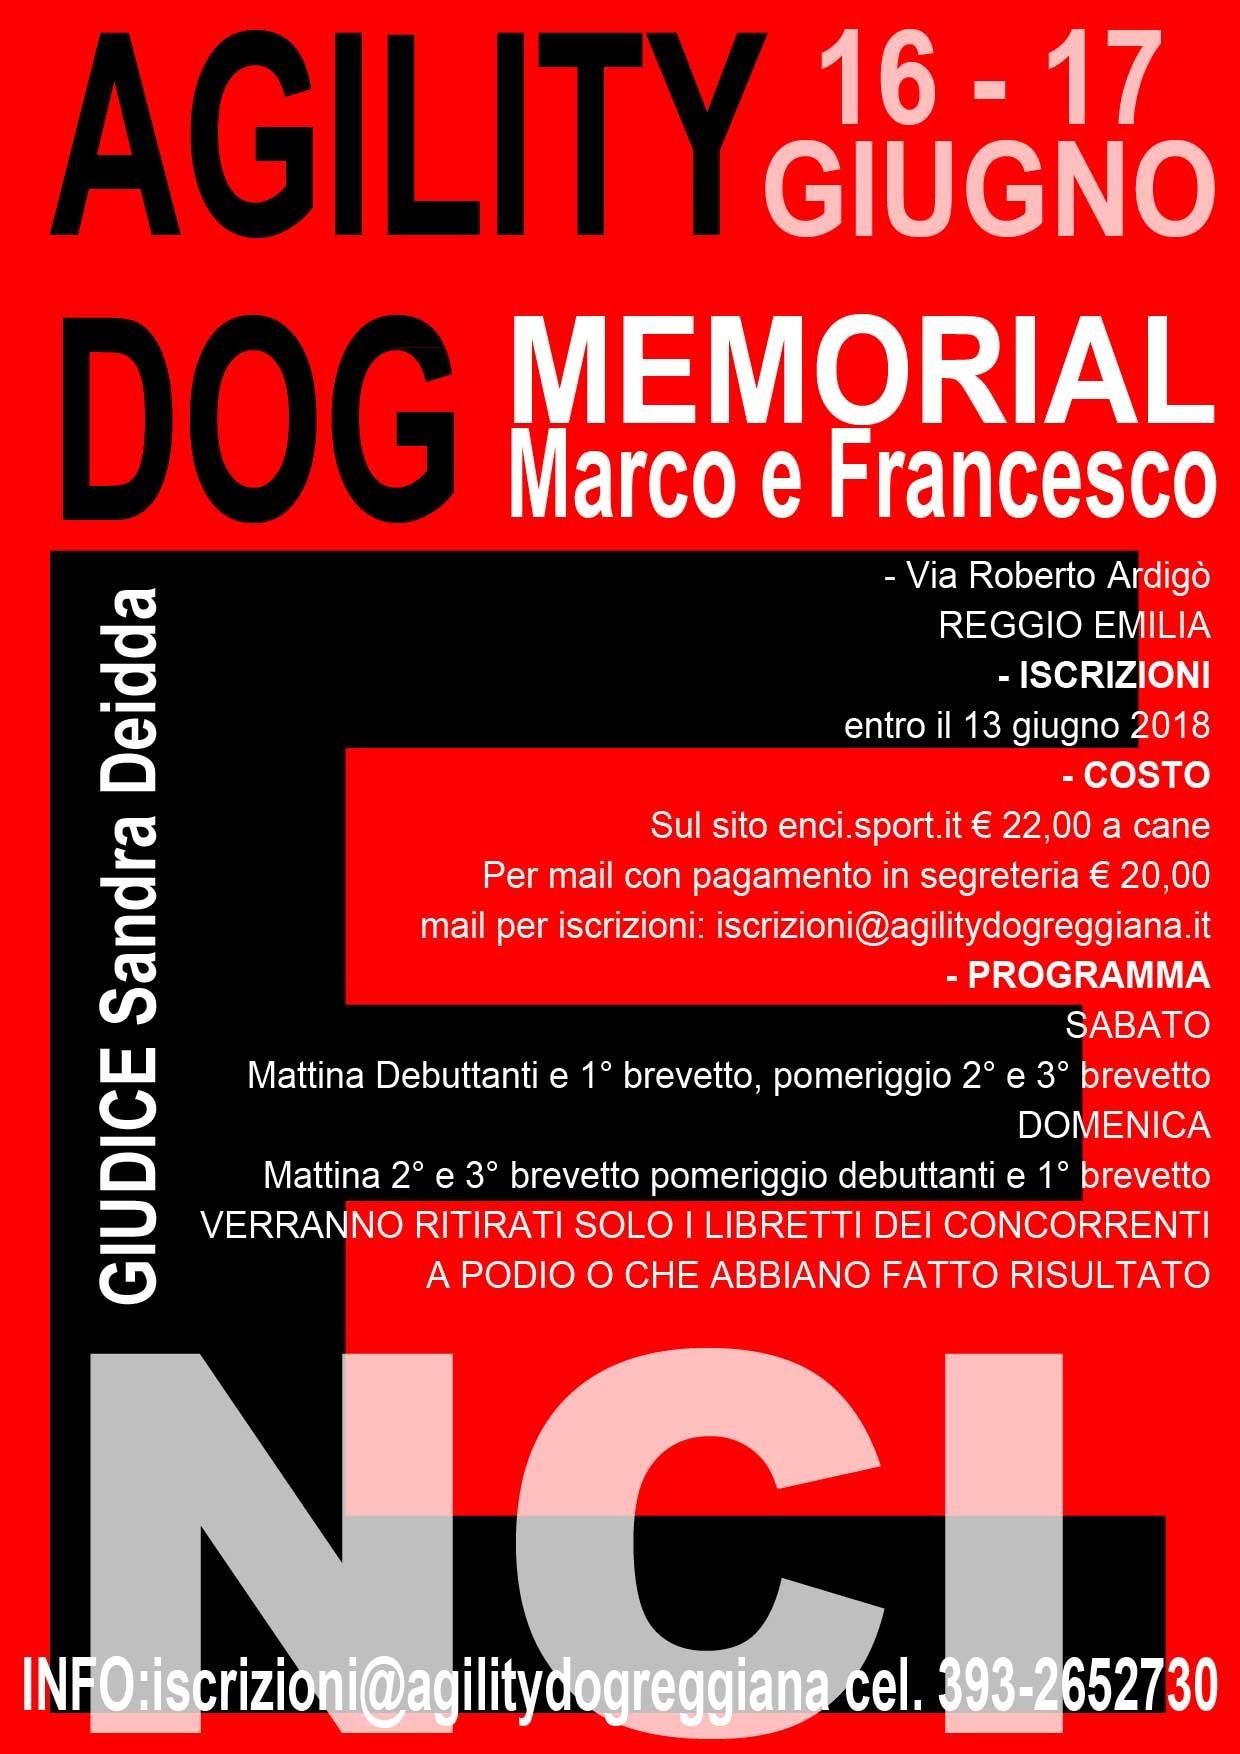 Memorial Marco e Francesco 2